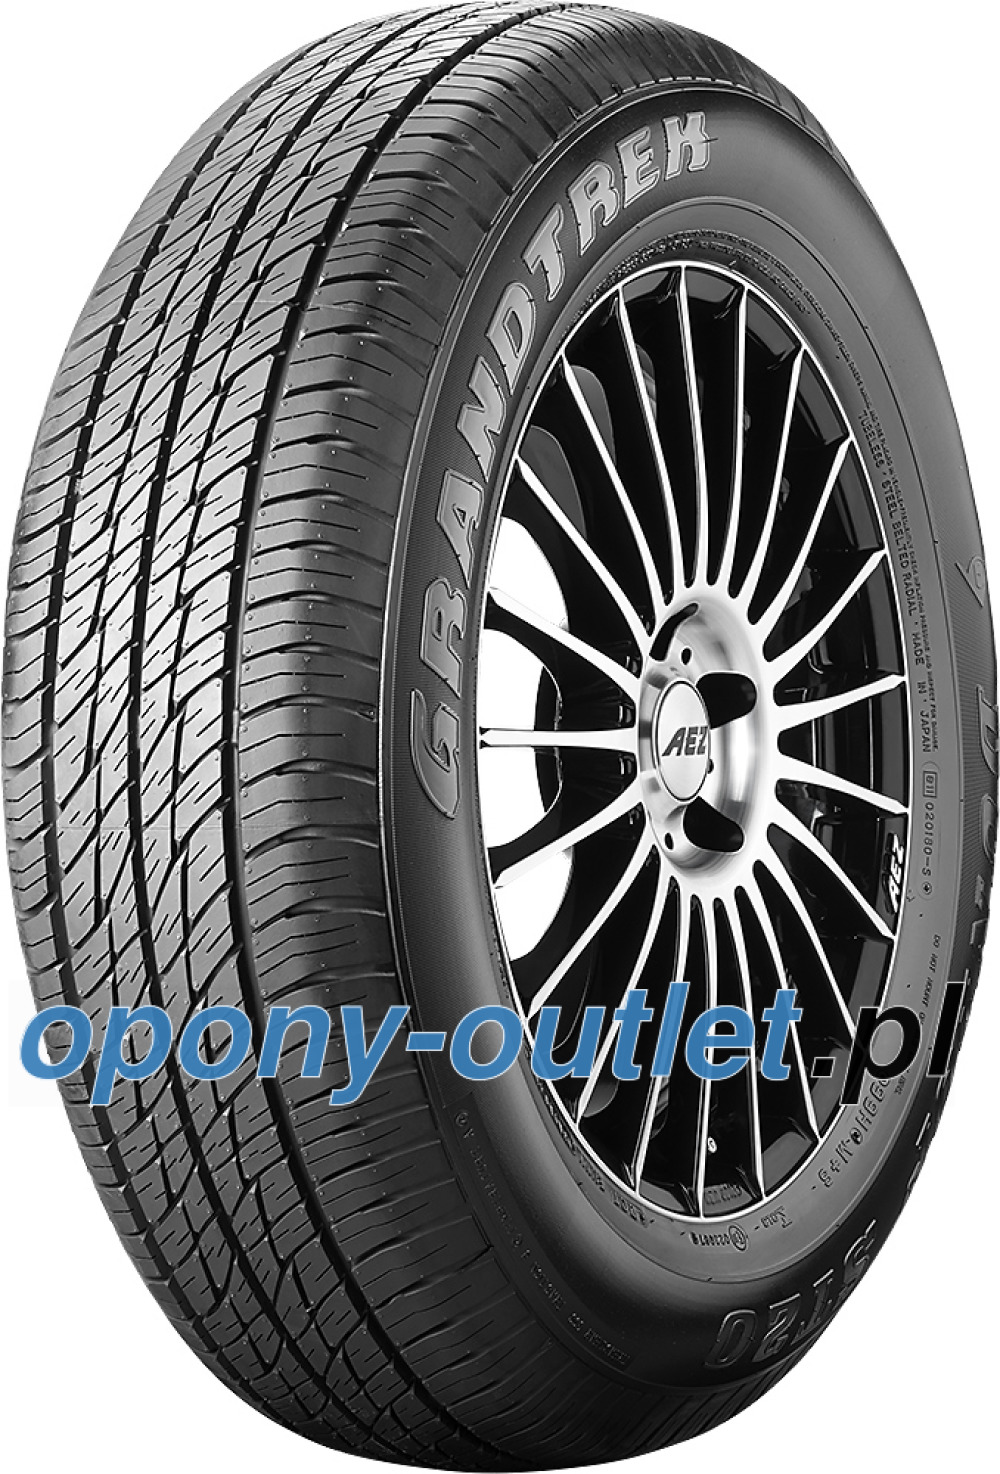 Dunlop Grandtrek ST 20 ( 215/60 R17 96H , prawa )